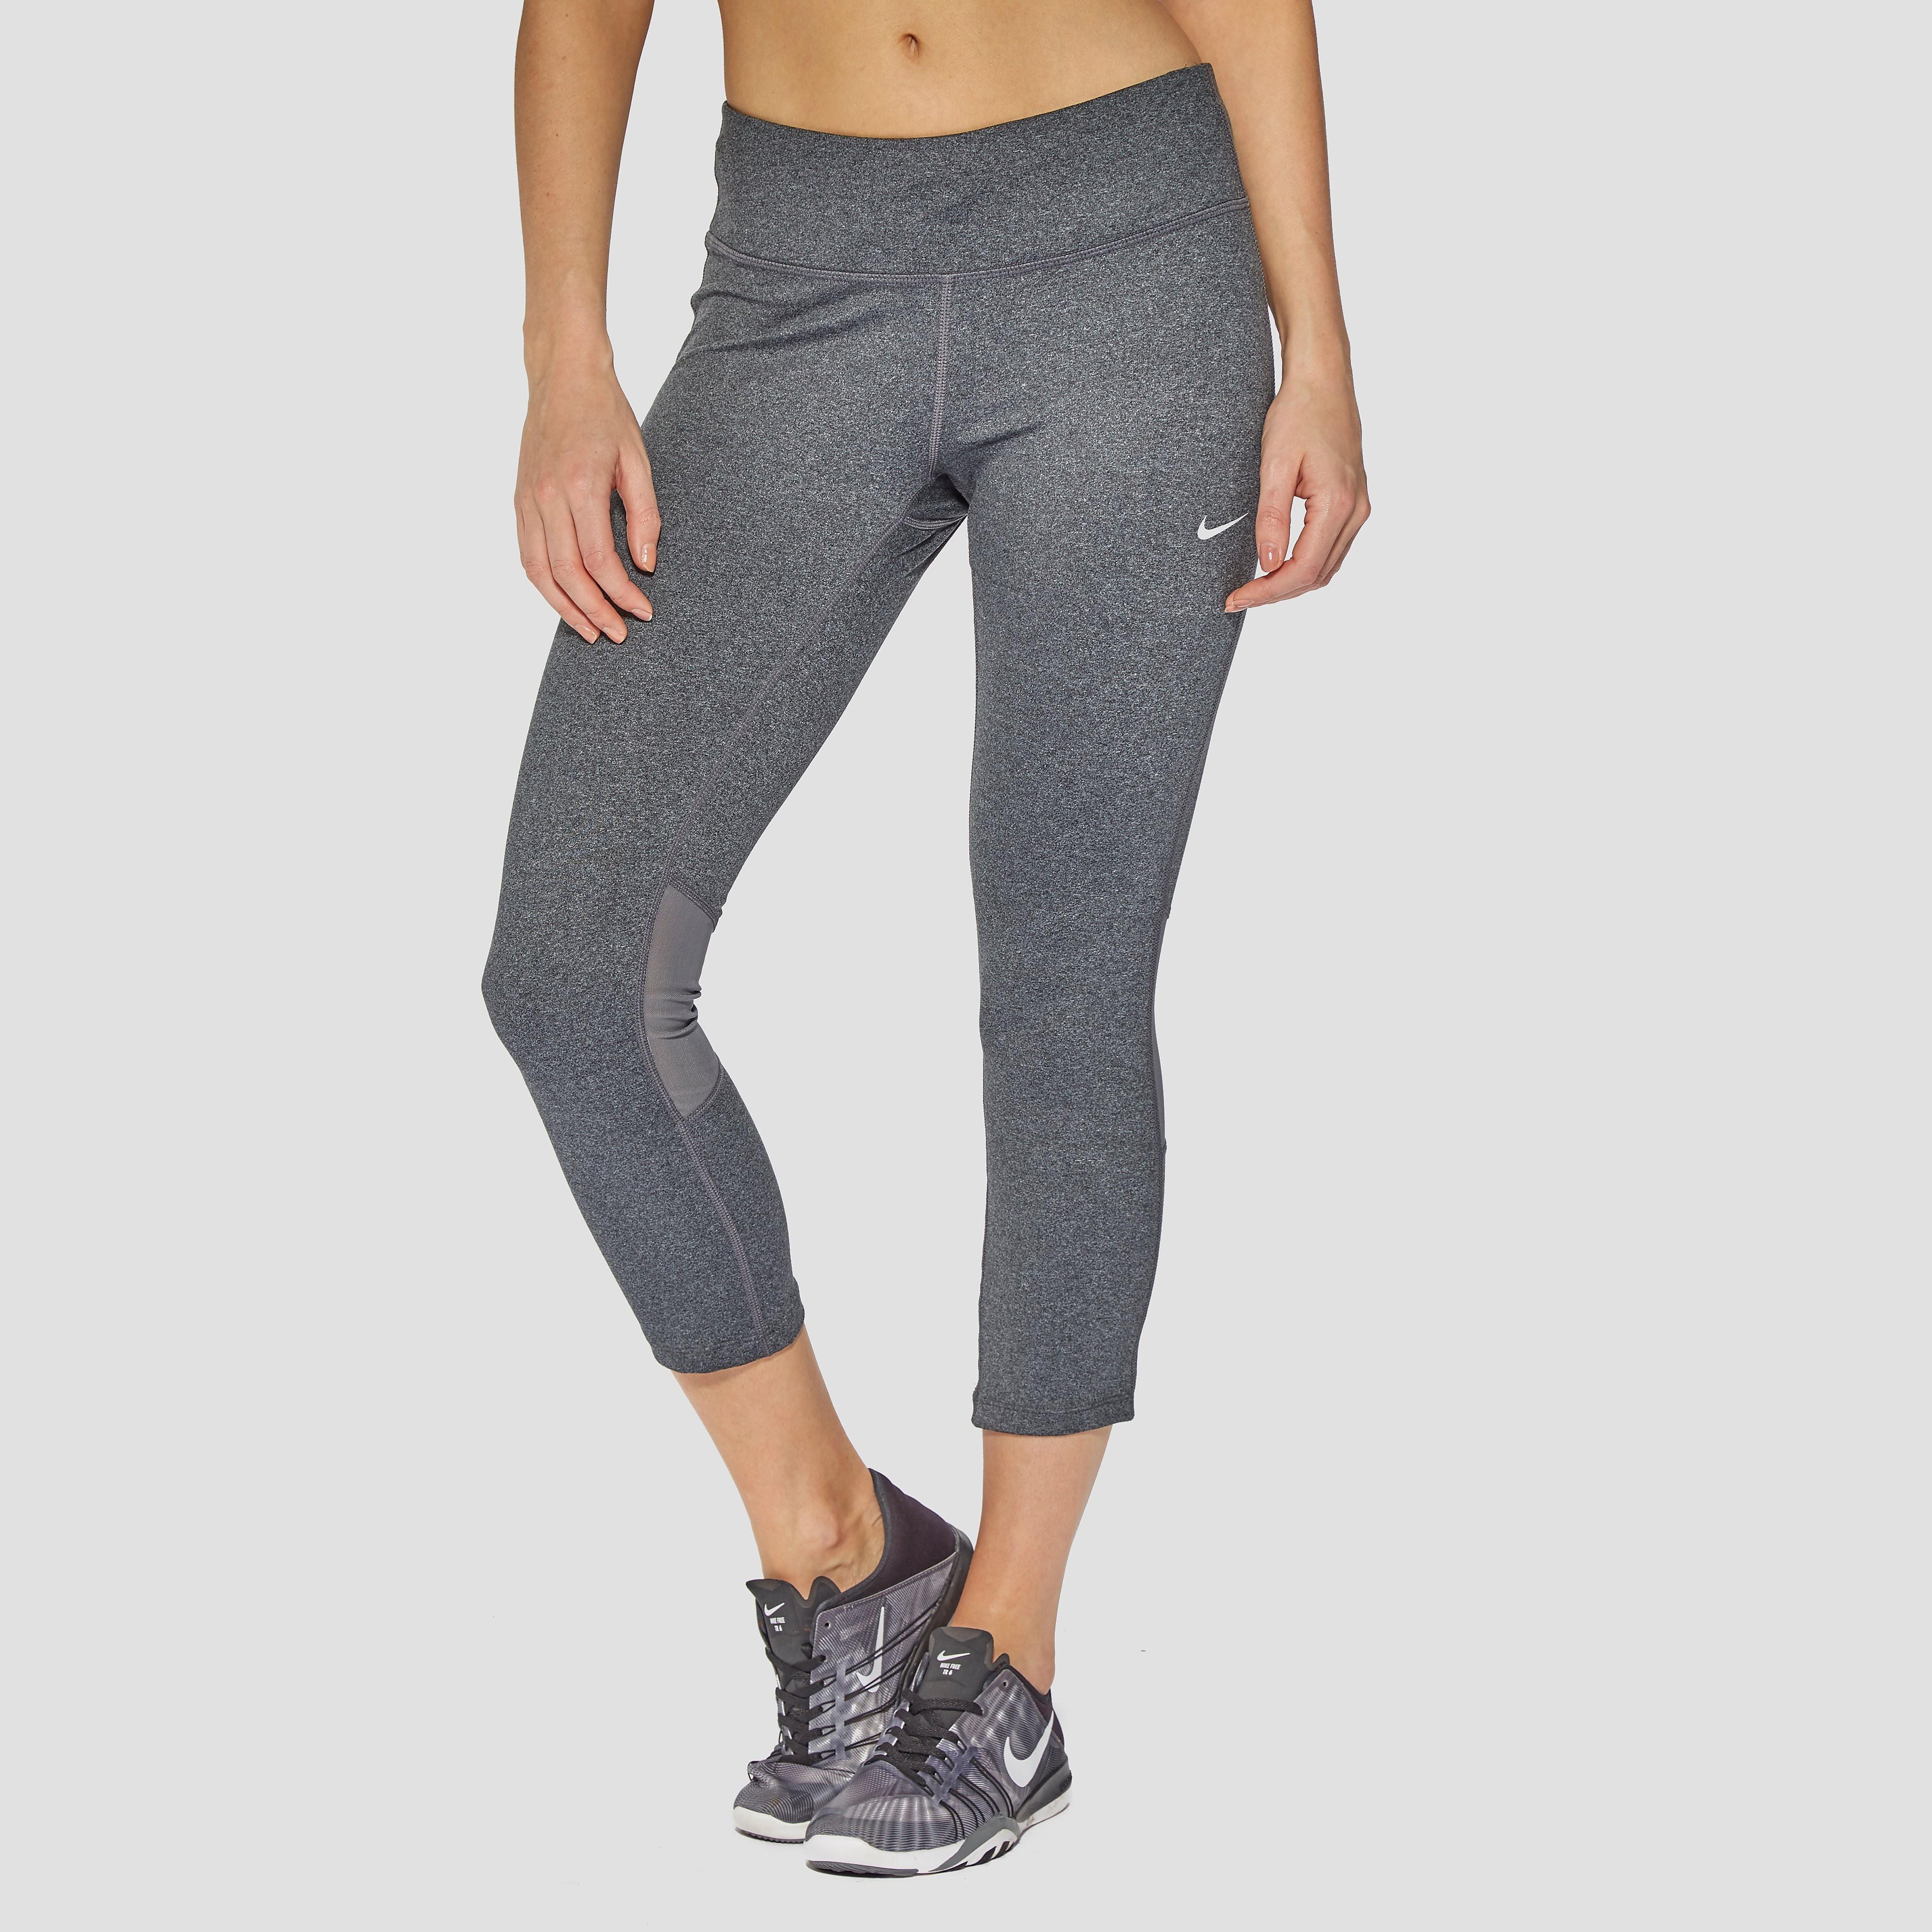 Nike Women's Dri-FIT Epic Run Running Capris